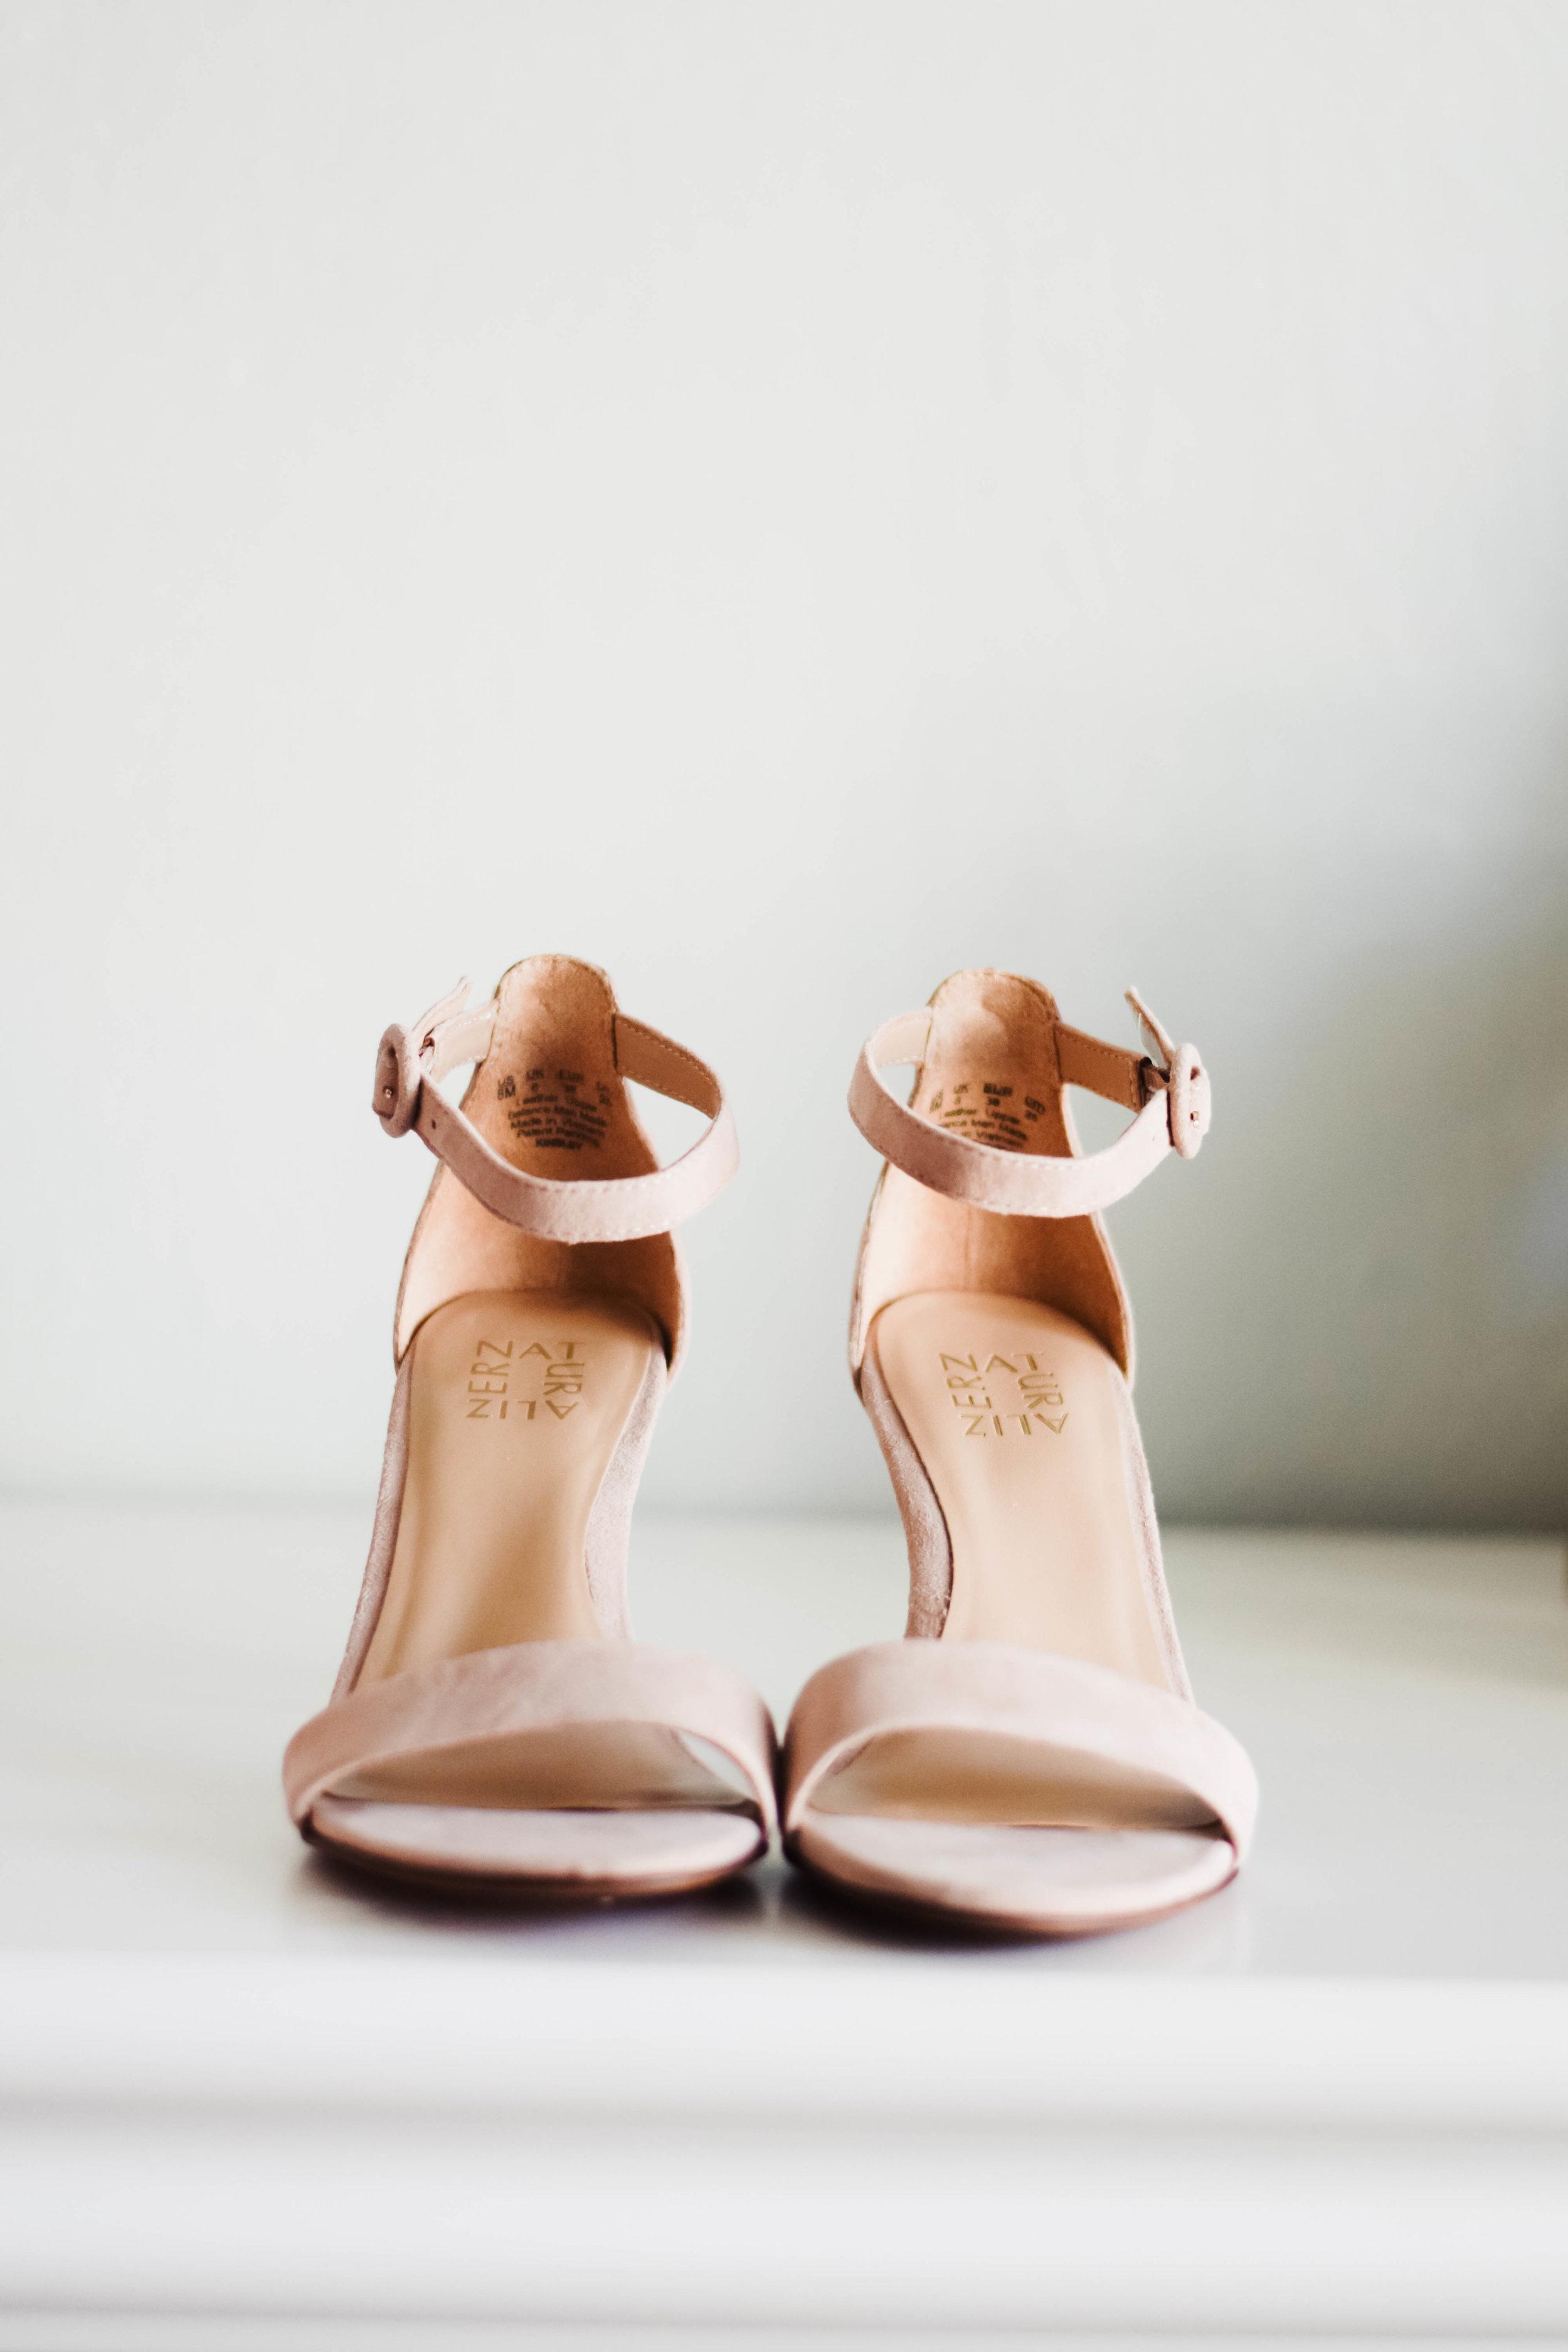 Comfortable Wedding Heels - Comfortable Bridal Heels - Naturalizer - The Overwhelmed Bride Wedding Blog